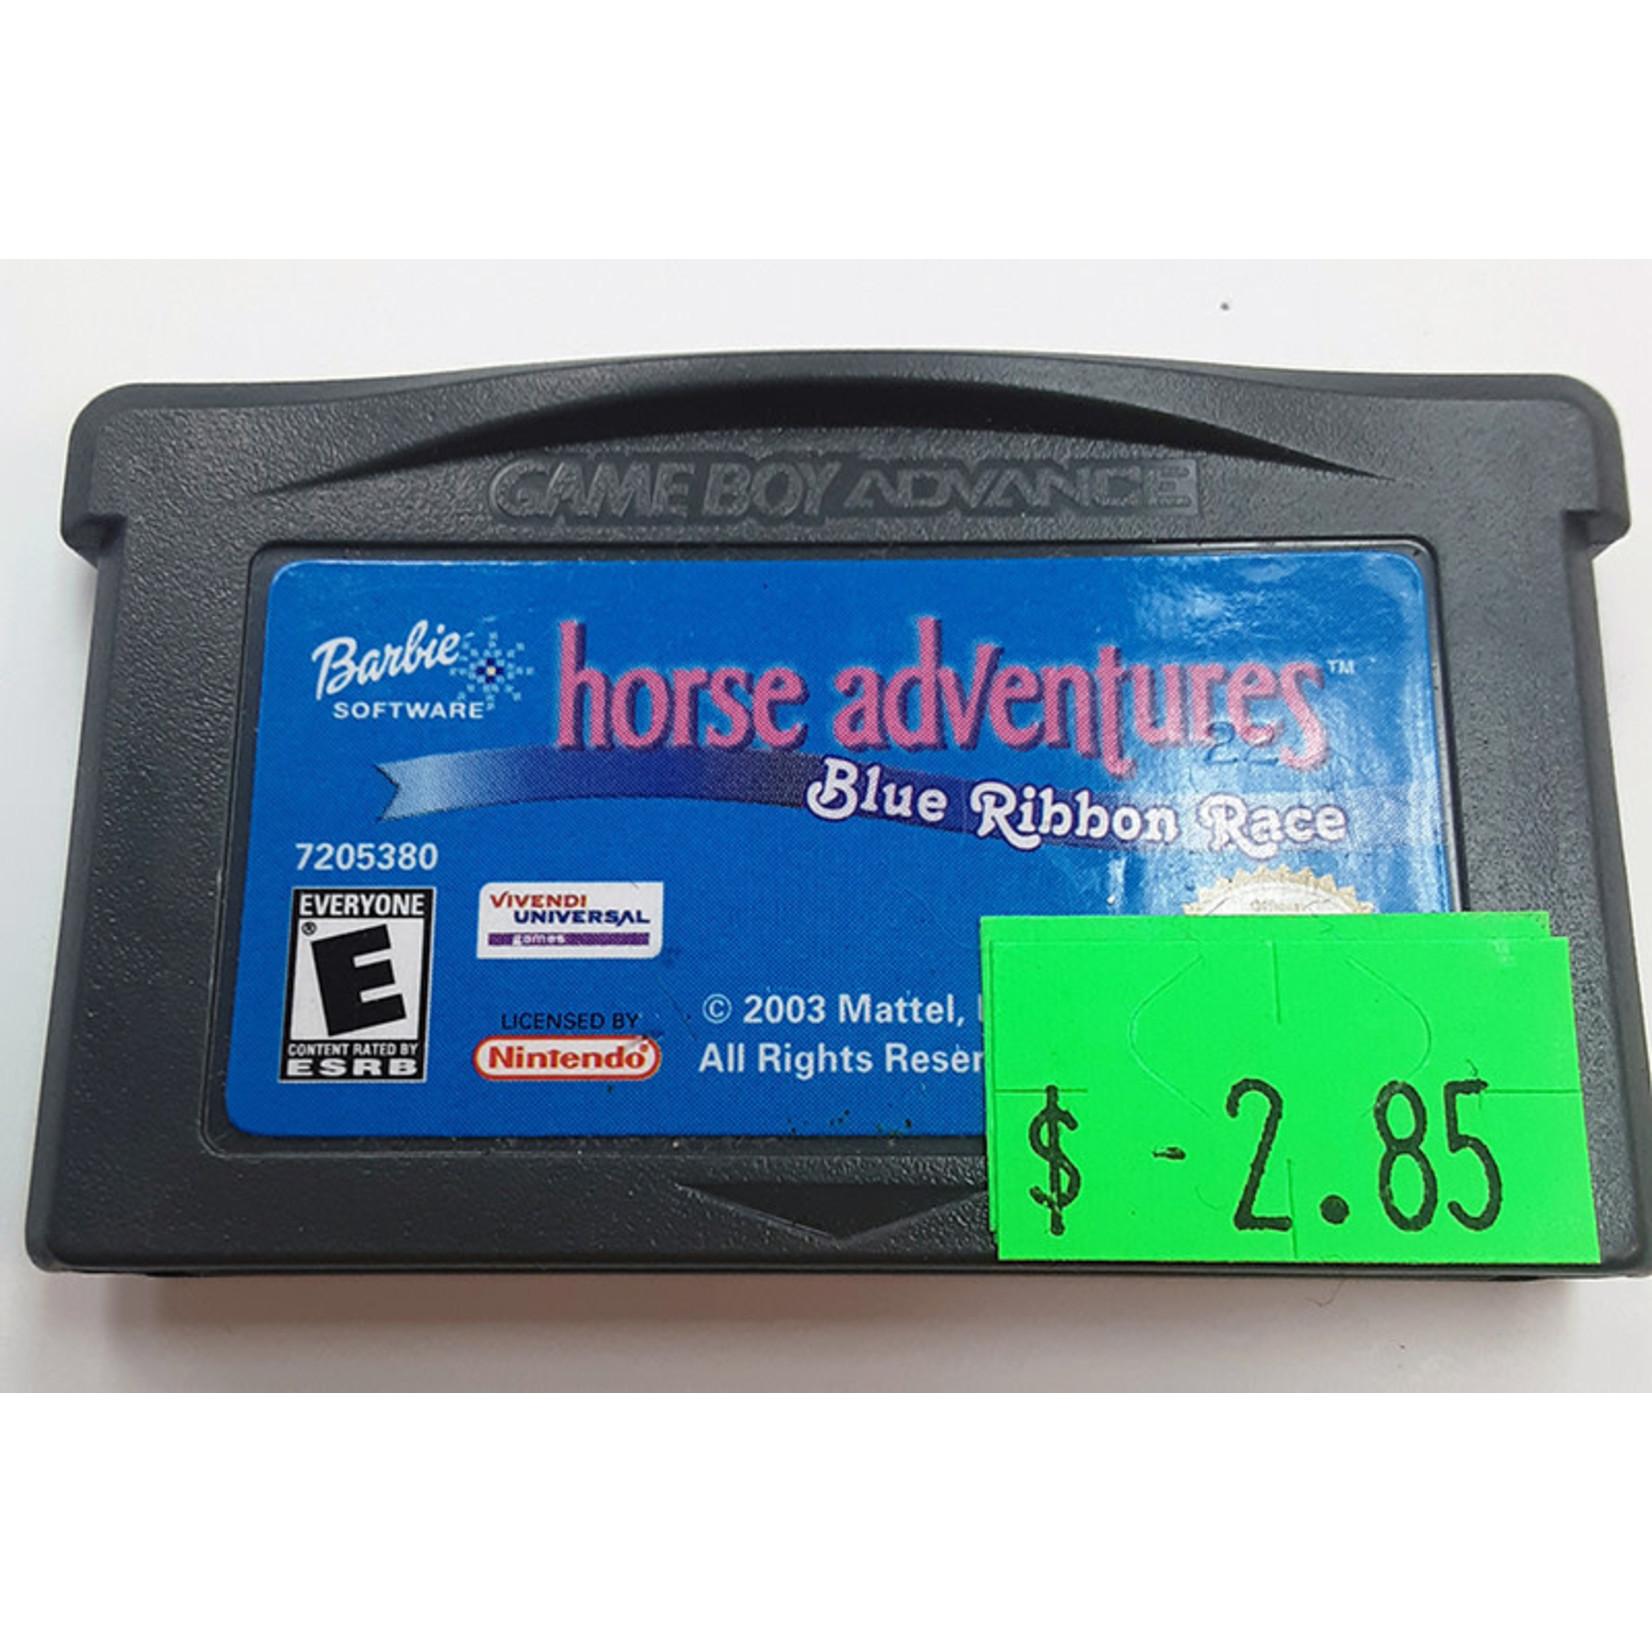 GBAu-Barbie Horse Adventures Blue Ribbon Race (cartridge)